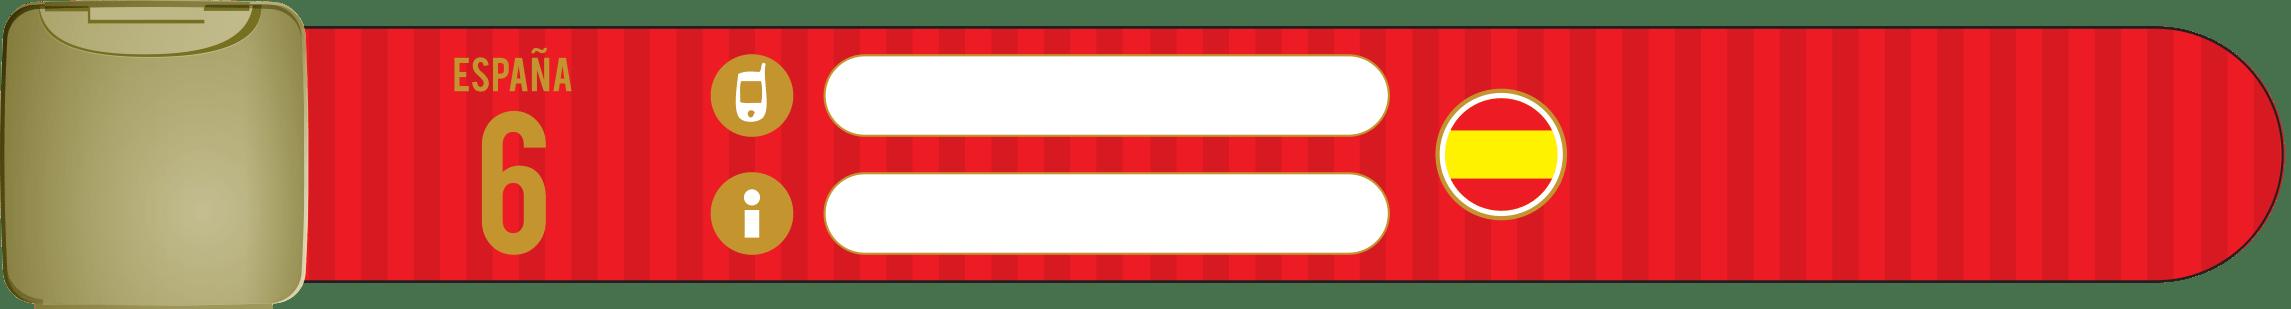 Spanien - La Furia Roja